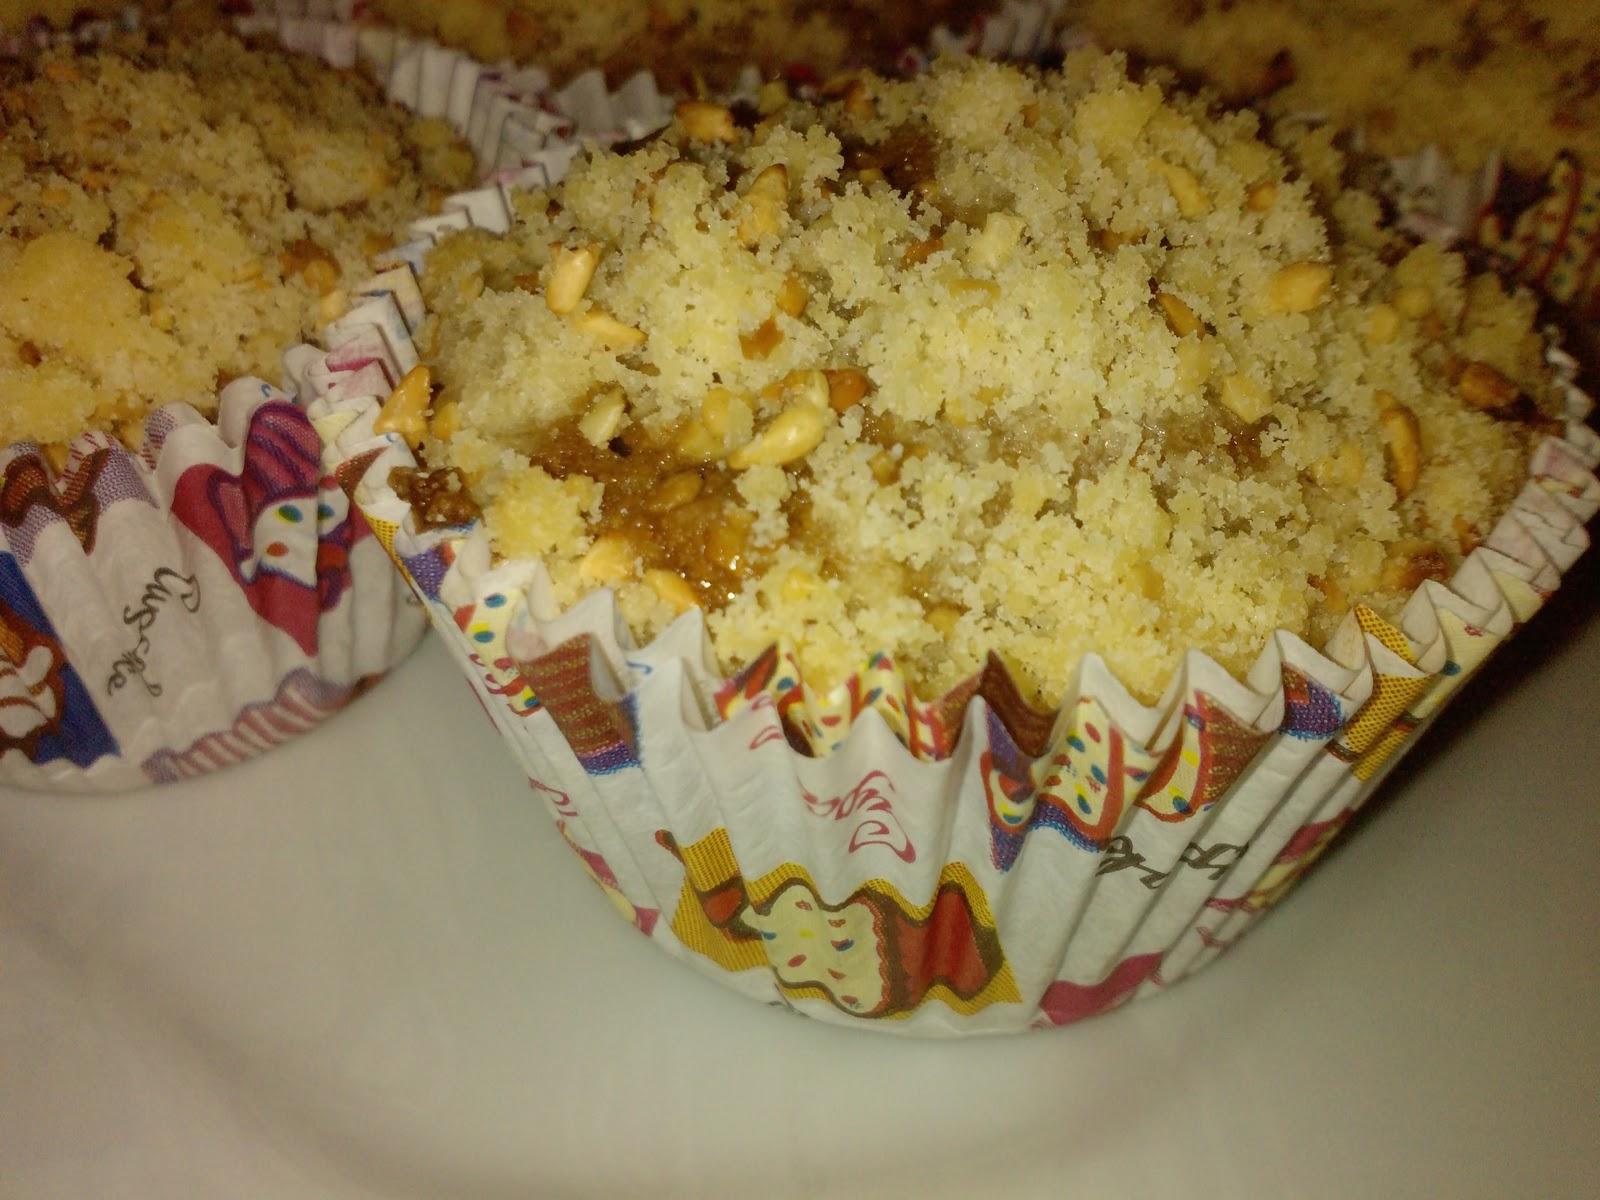 Cupcake Integral de Açúcar Mascavo